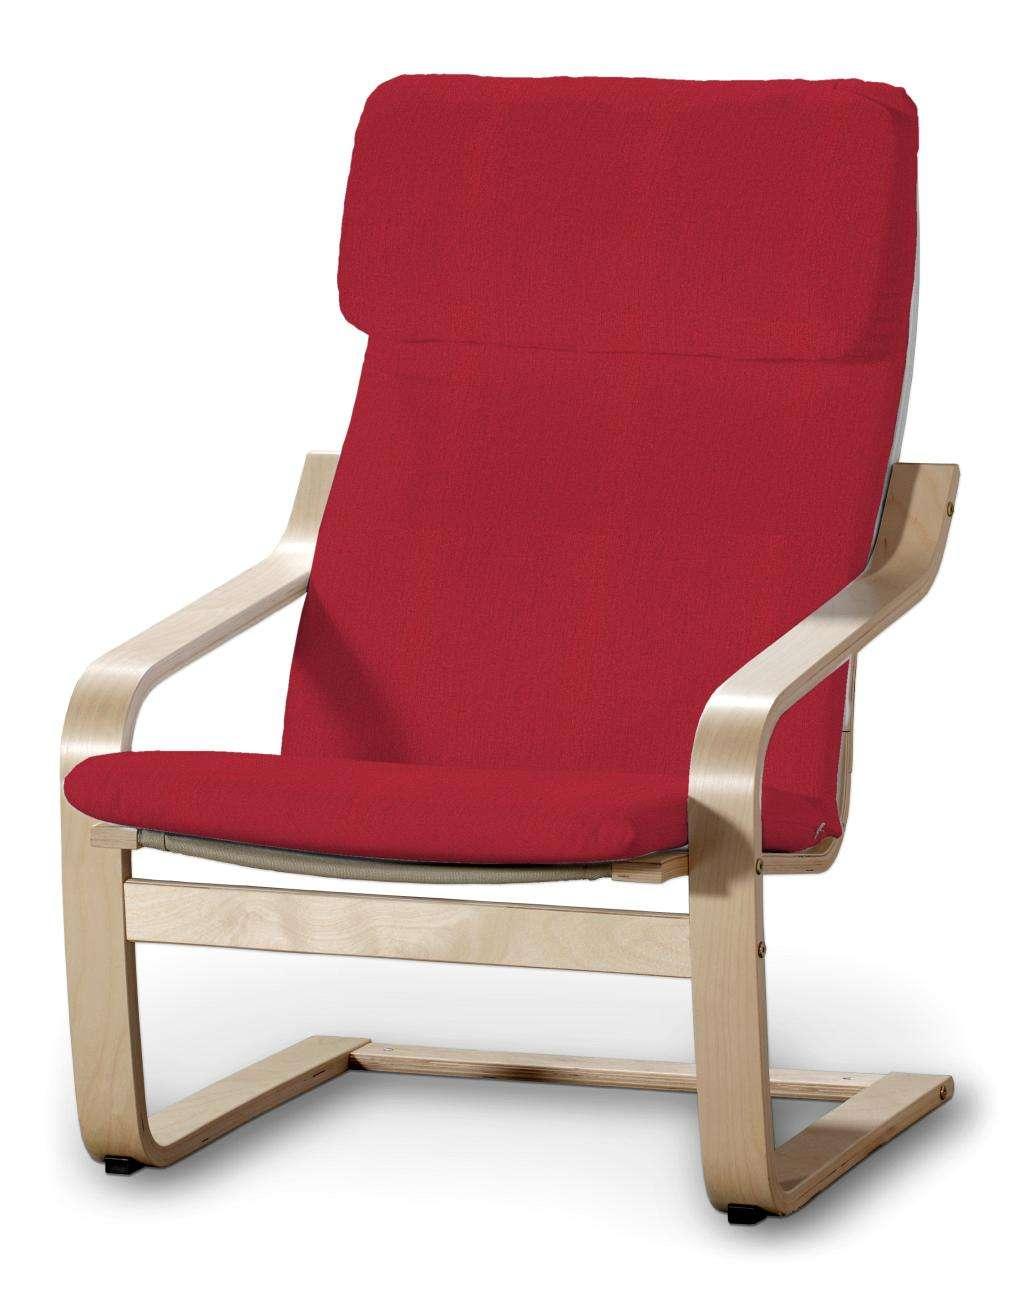 Poäng Sesselbezug I von der Kollektion Chenille , Stoff: 702-24